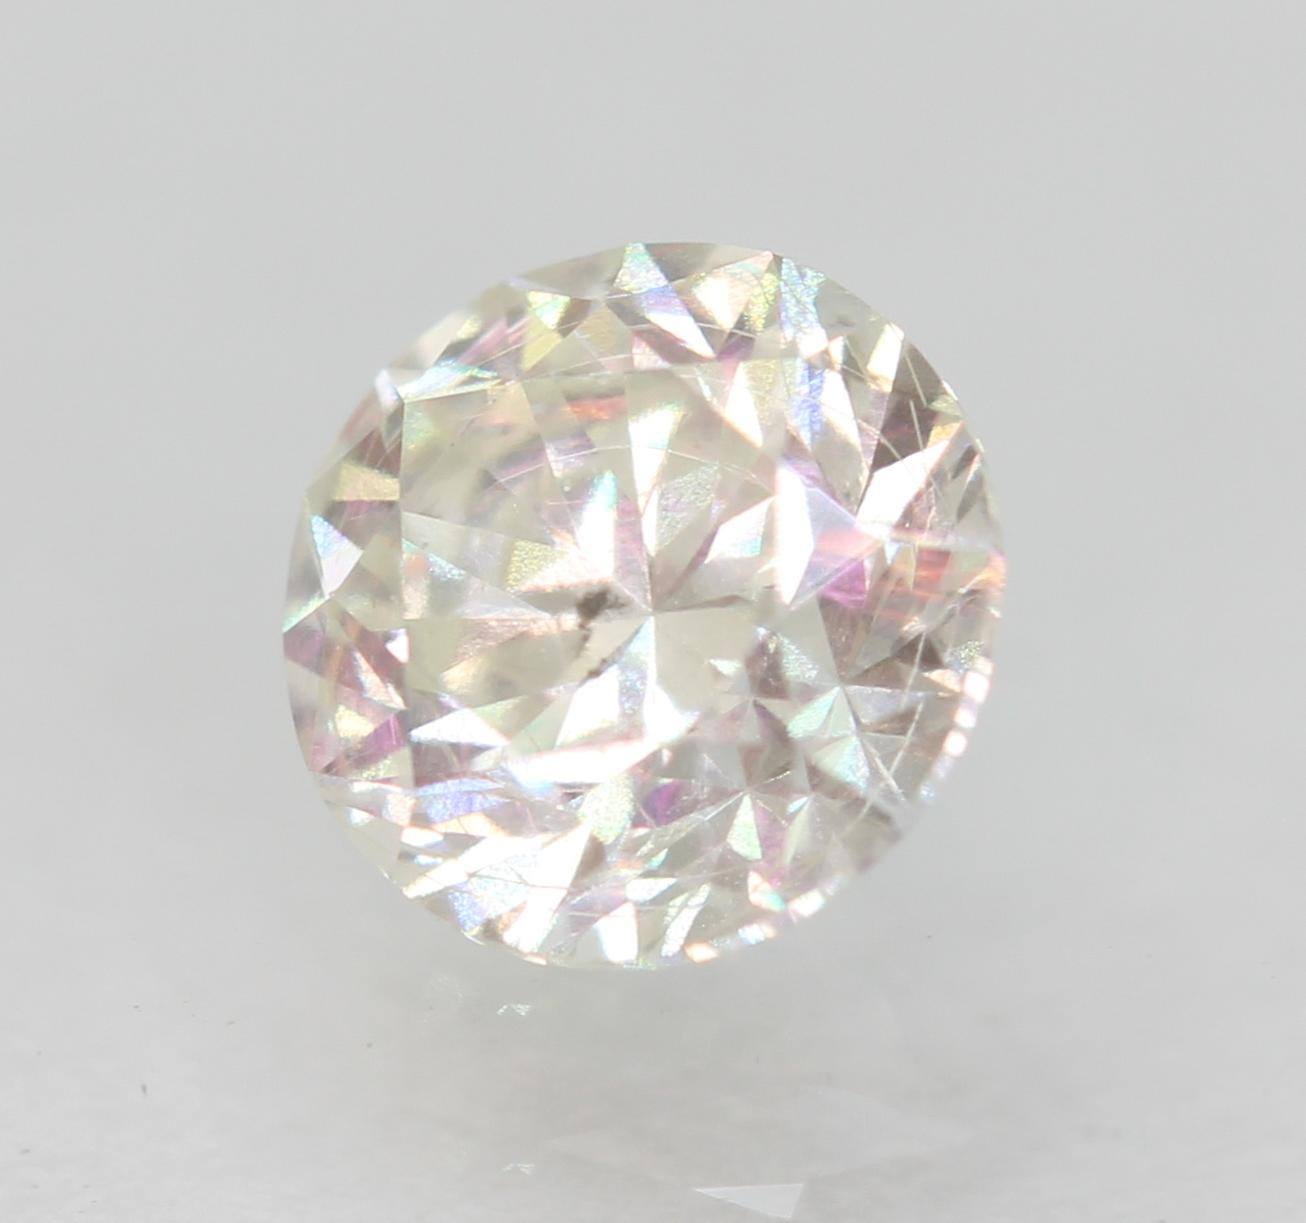 Certified 0.46 Carat H VS2 Round Brilliant Enhanced Natural Loose Diamond 4.79mm